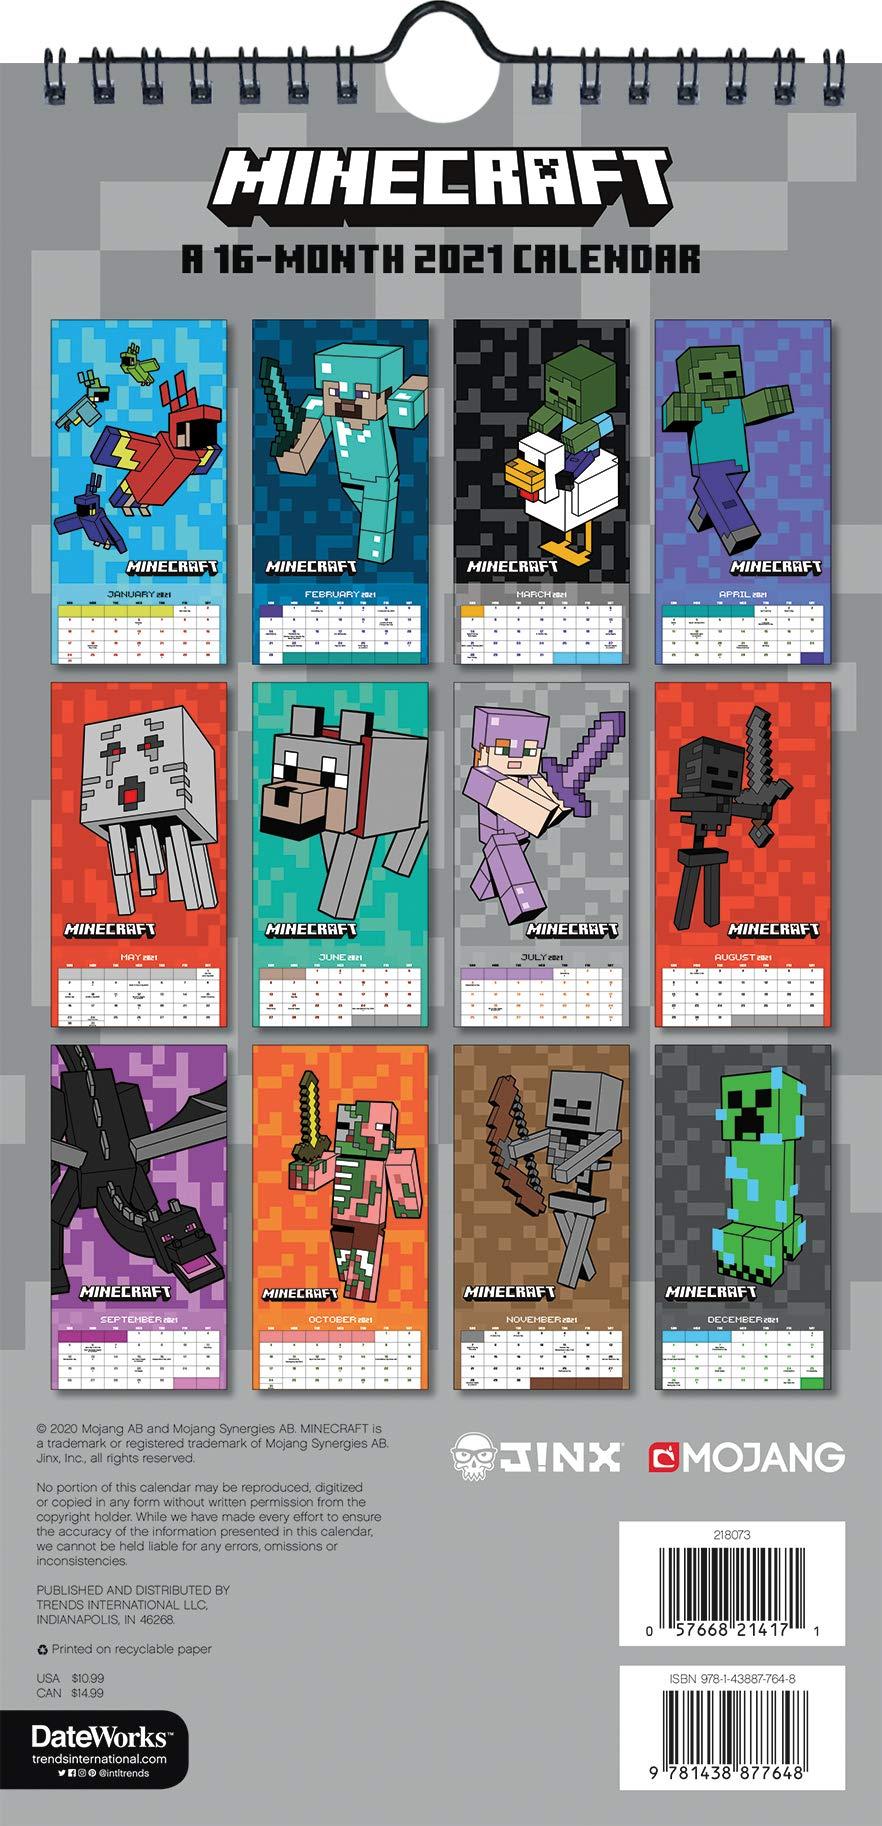 Minecraft 8 Calendar: Amazon.de: Trends: Fremdsprachige Bücher